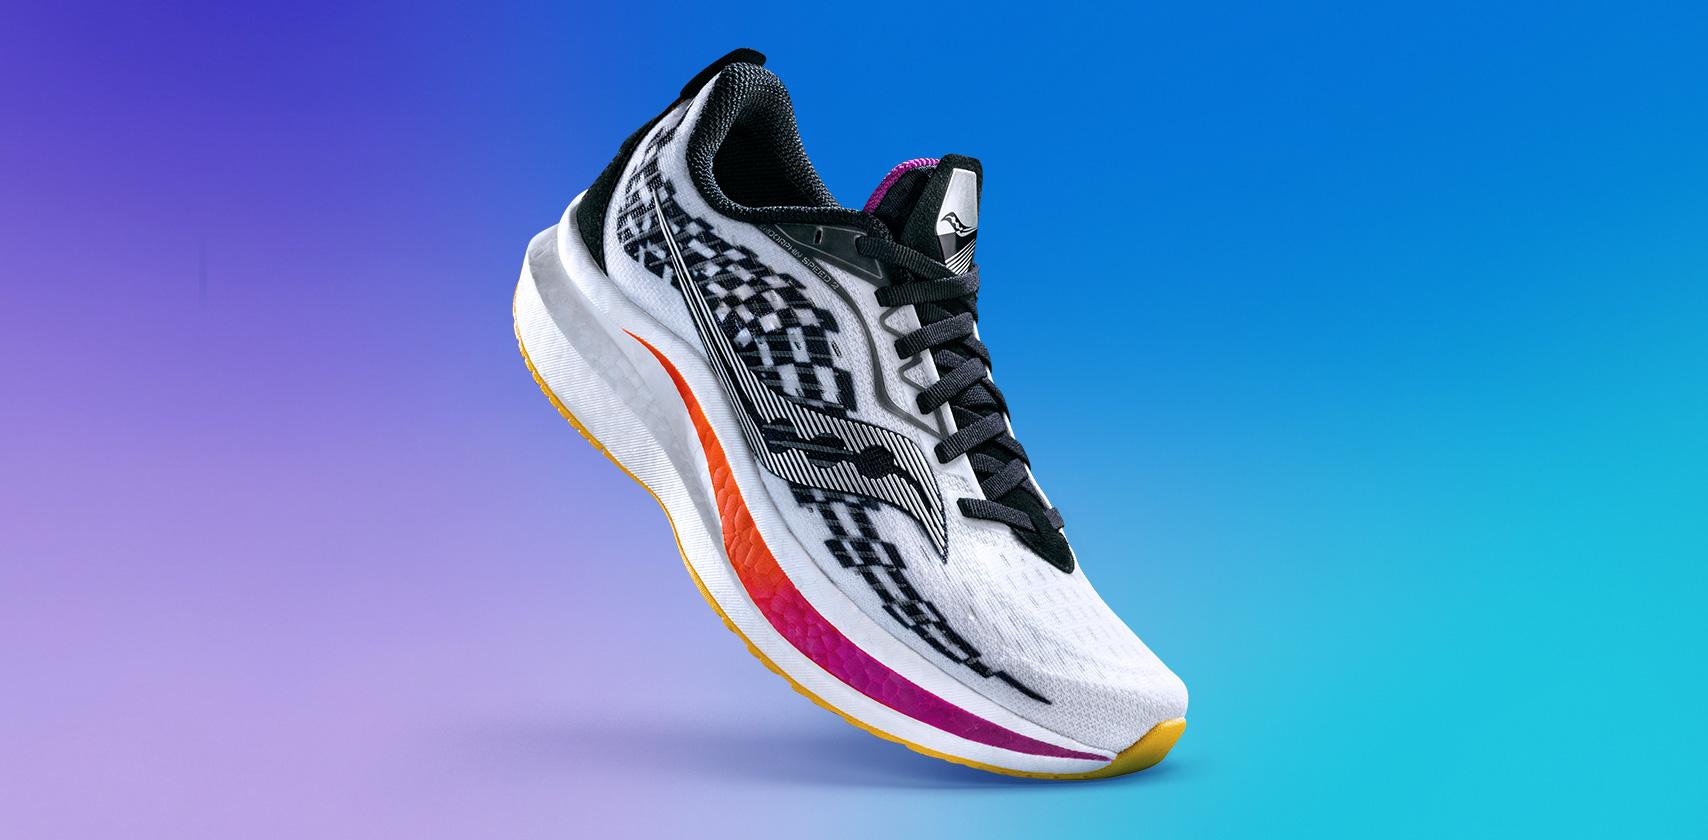 Black & white Endorphin Speed 2 with orange & purple swoosh.